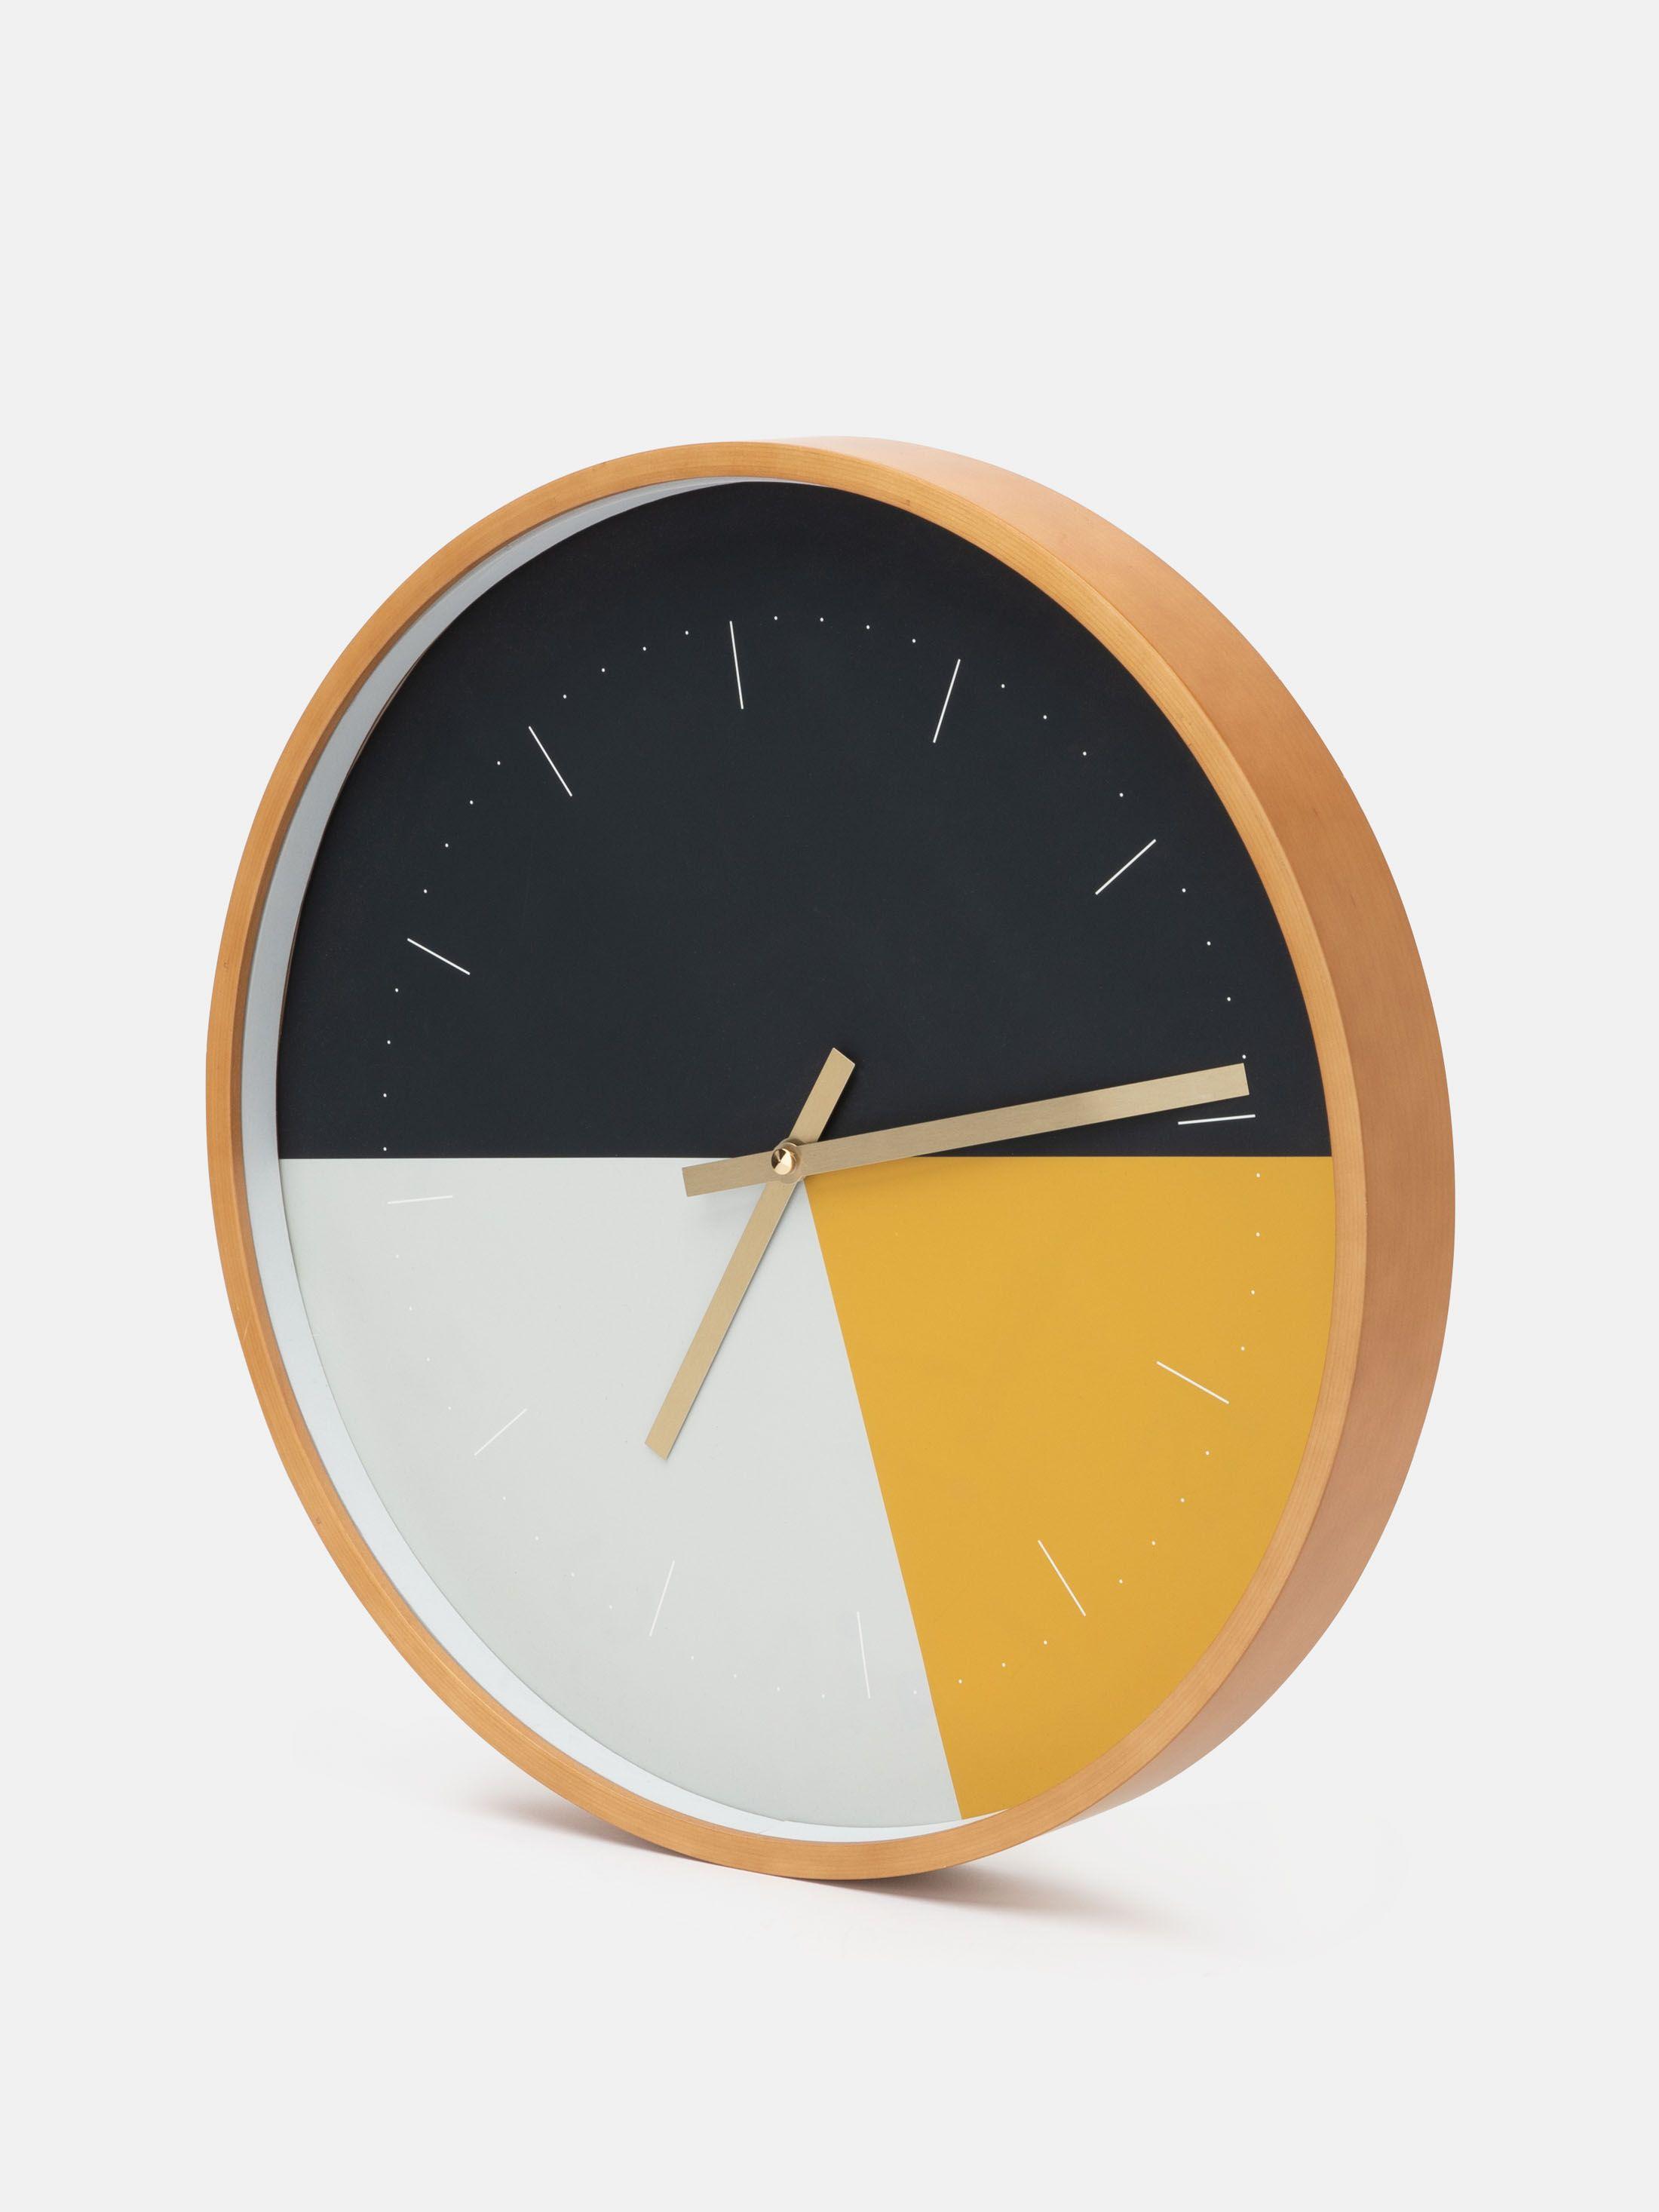 clock mechanism details for unique wall clocks